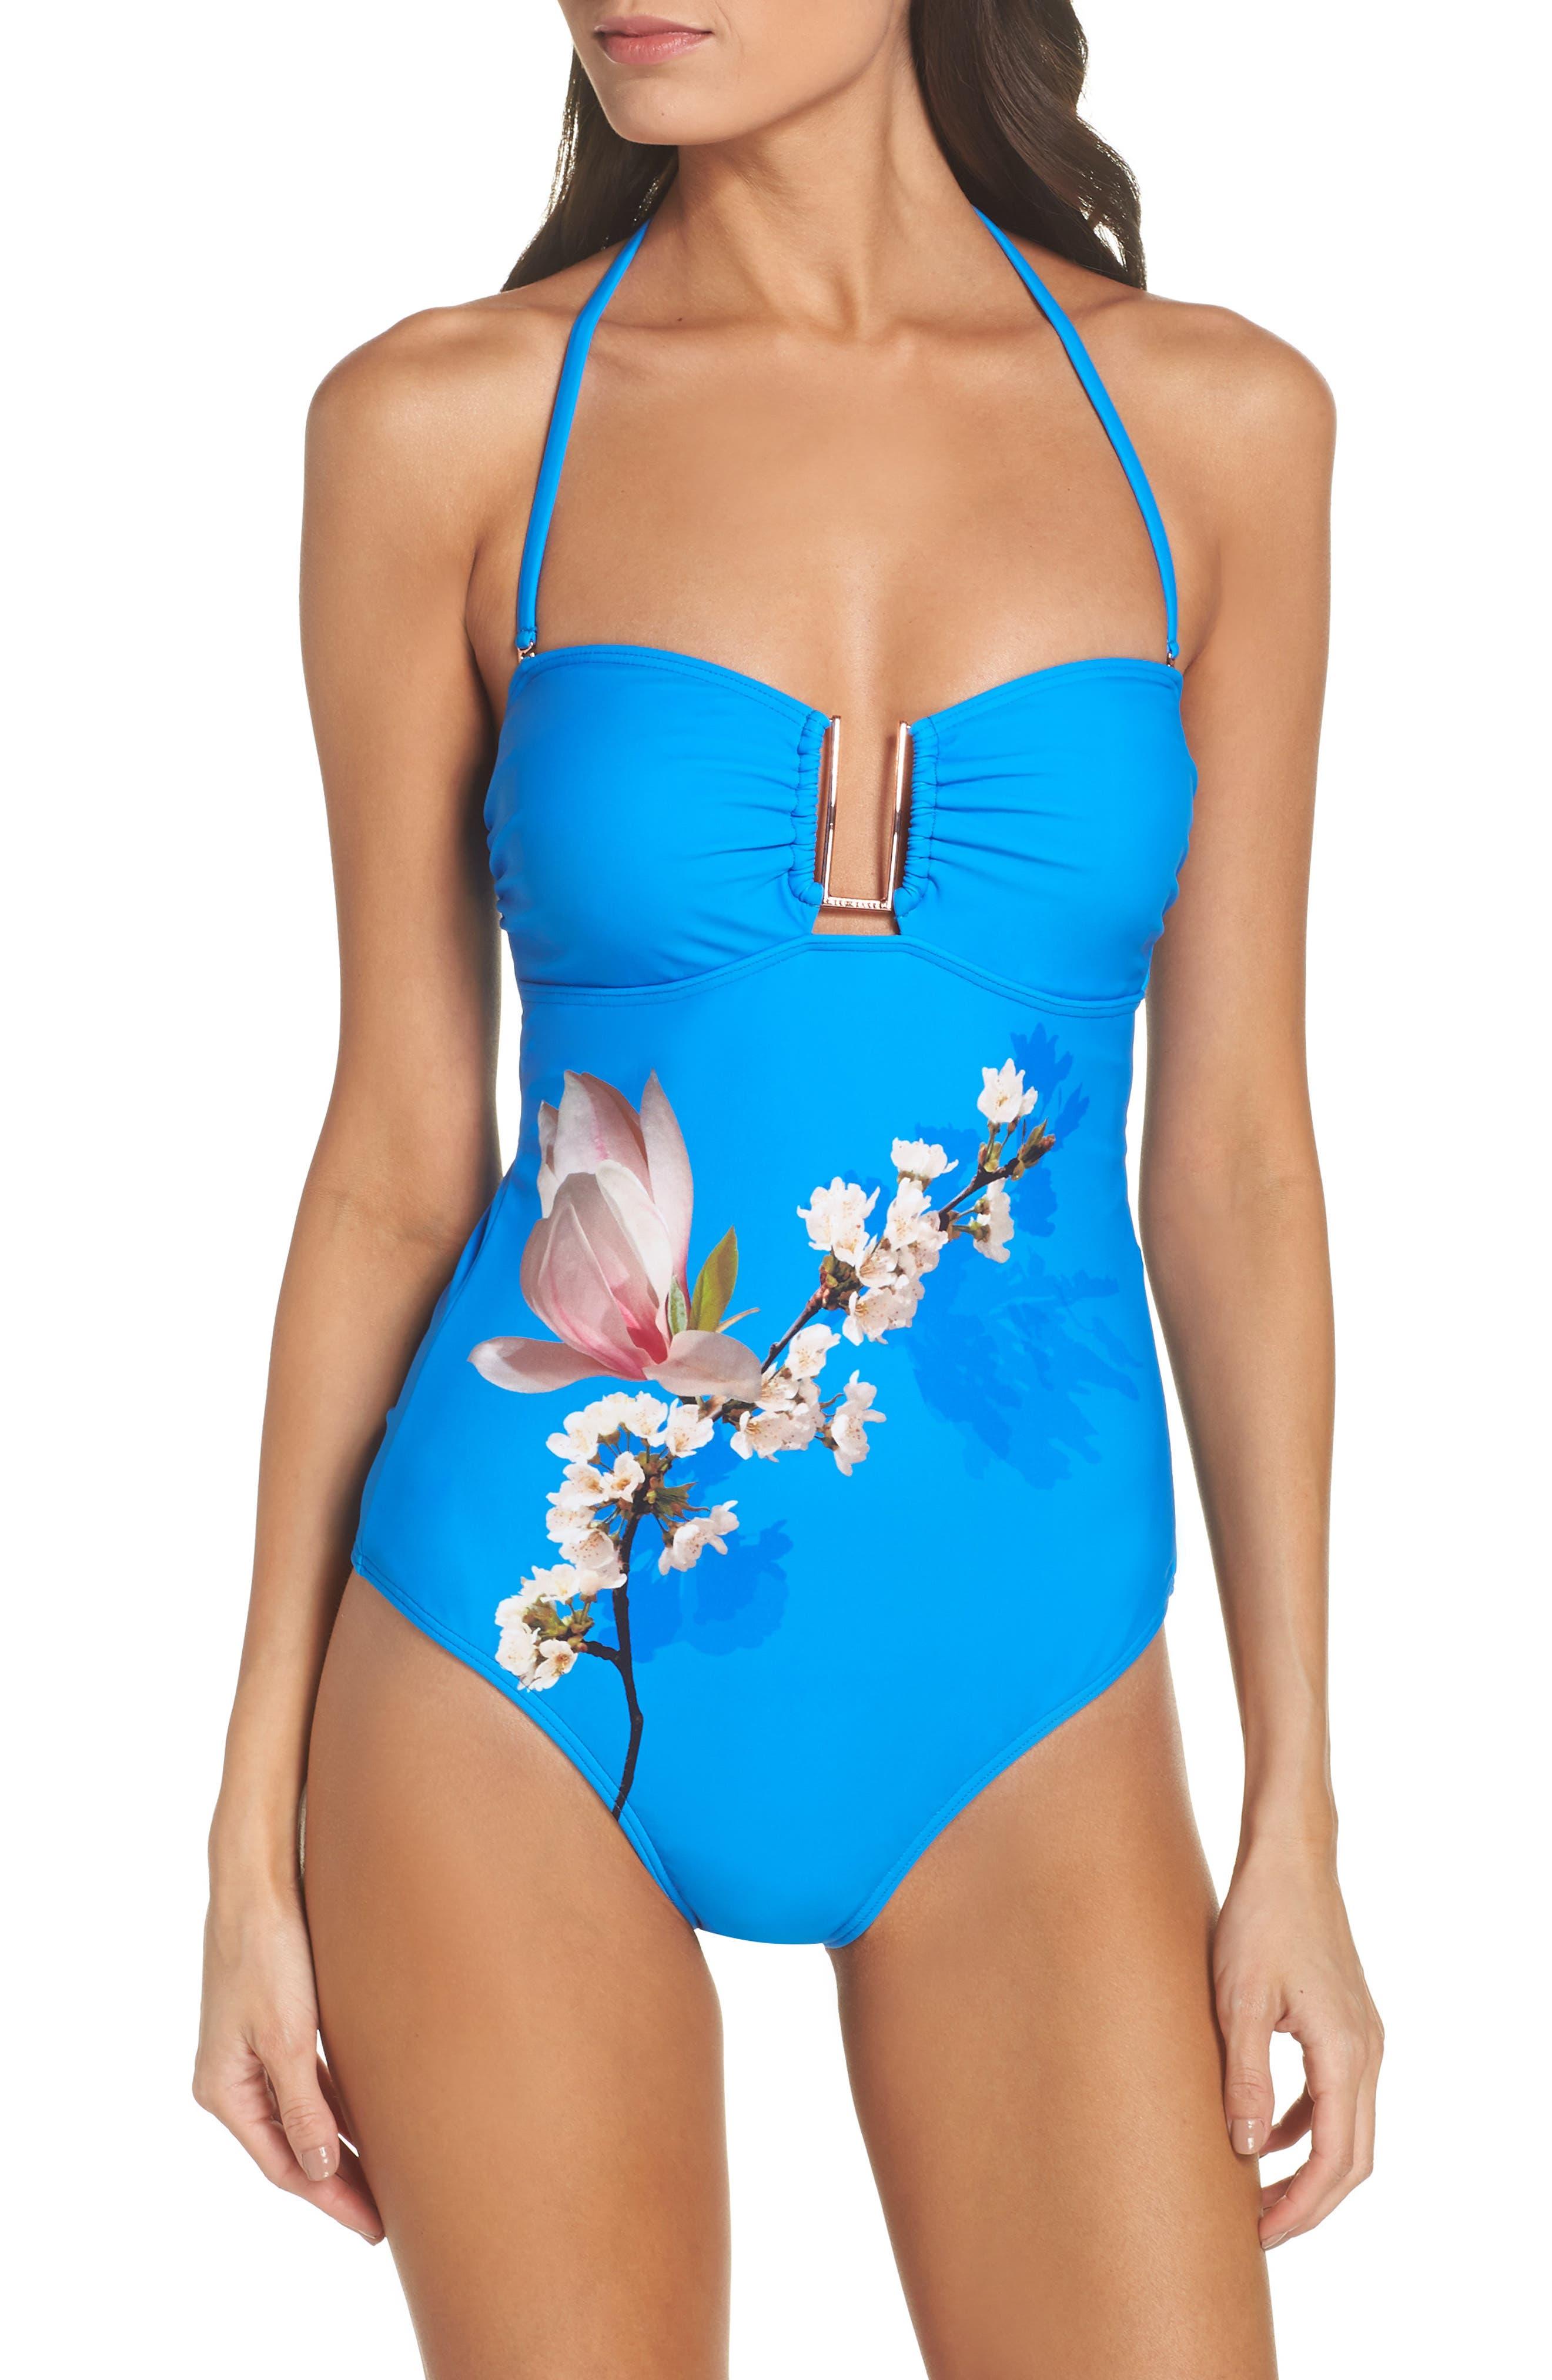 Harmony Bandeau One-Piece Swimsuit,                             Alternate thumbnail 2, color,                             Bright Blue